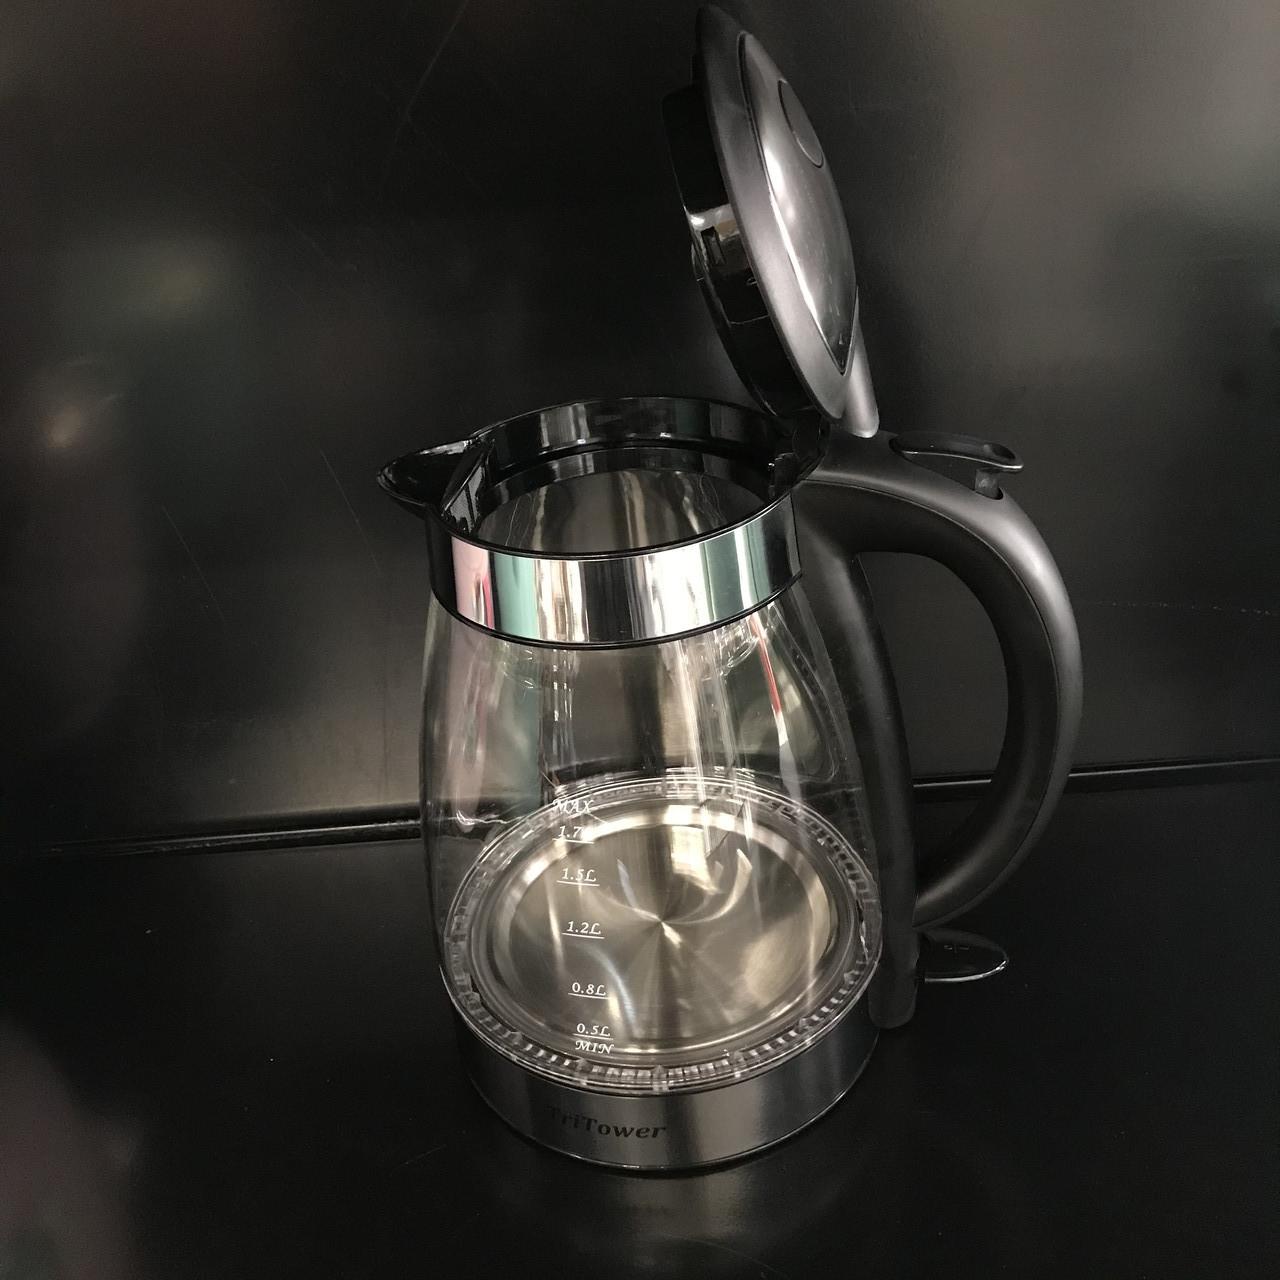 Электрический чайник. TriTower 2,2 L. - фото 1